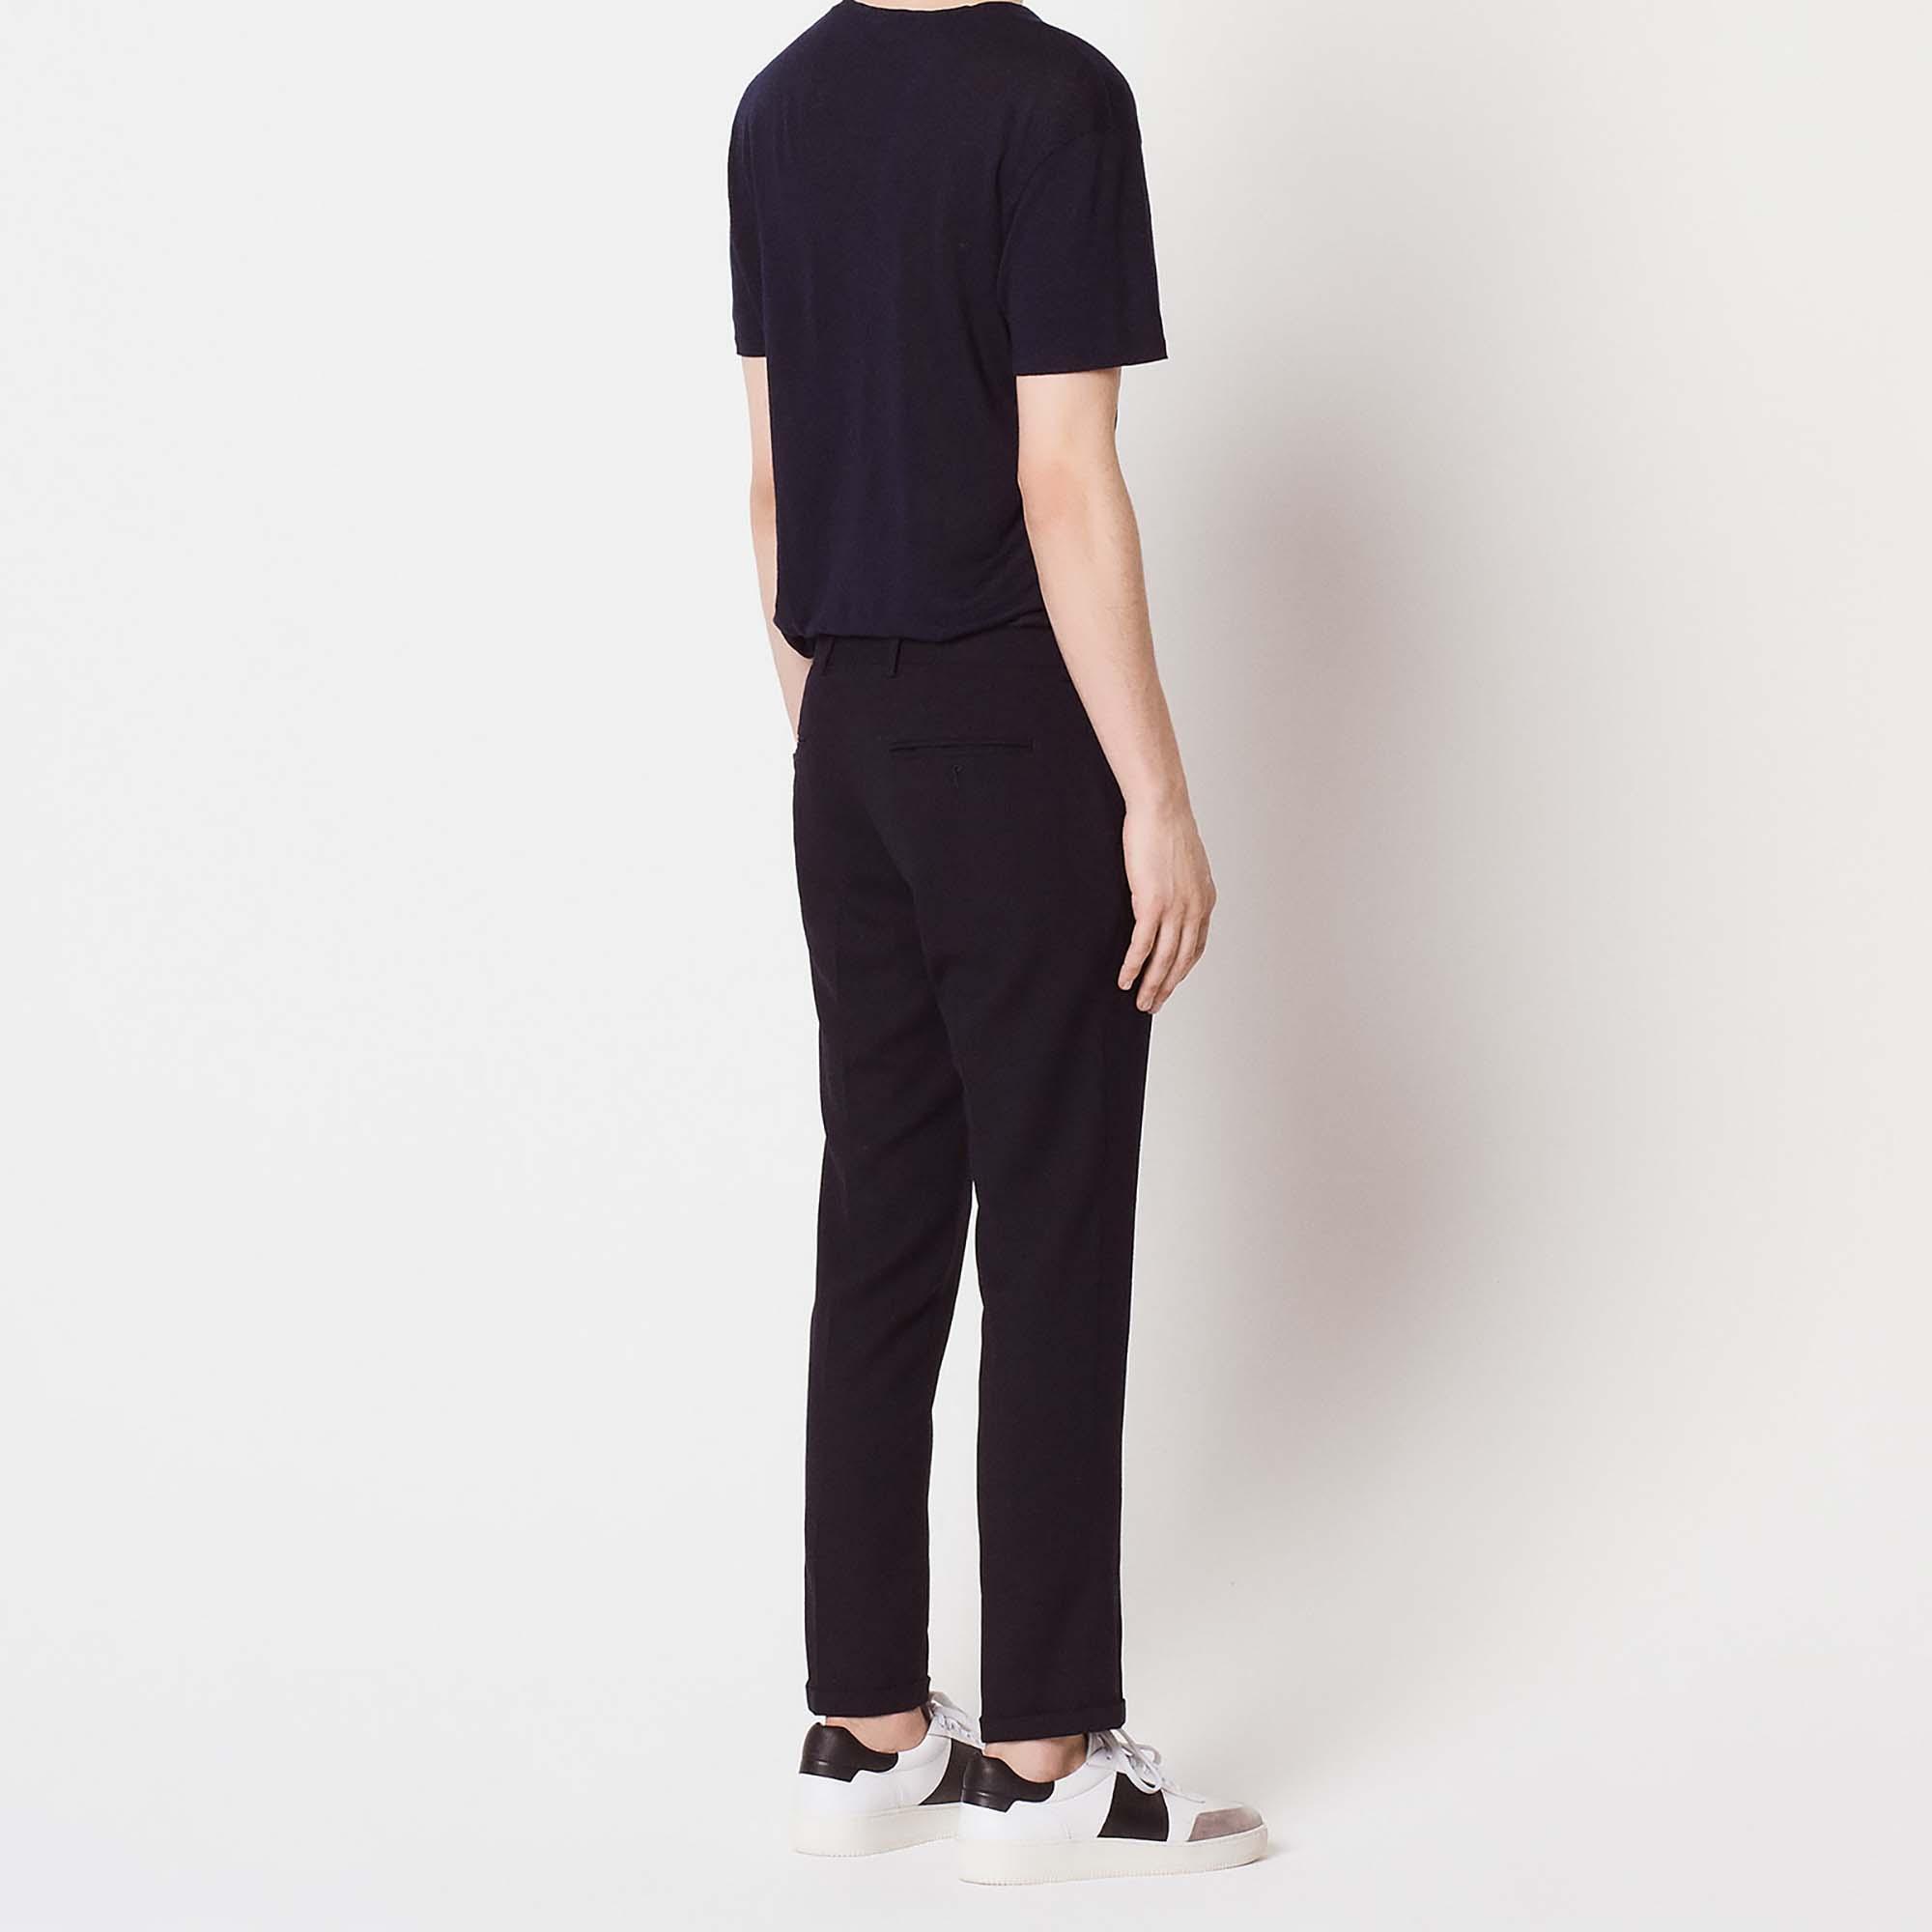 berkeley pantalons shorts sandro paris. Black Bedroom Furniture Sets. Home Design Ideas